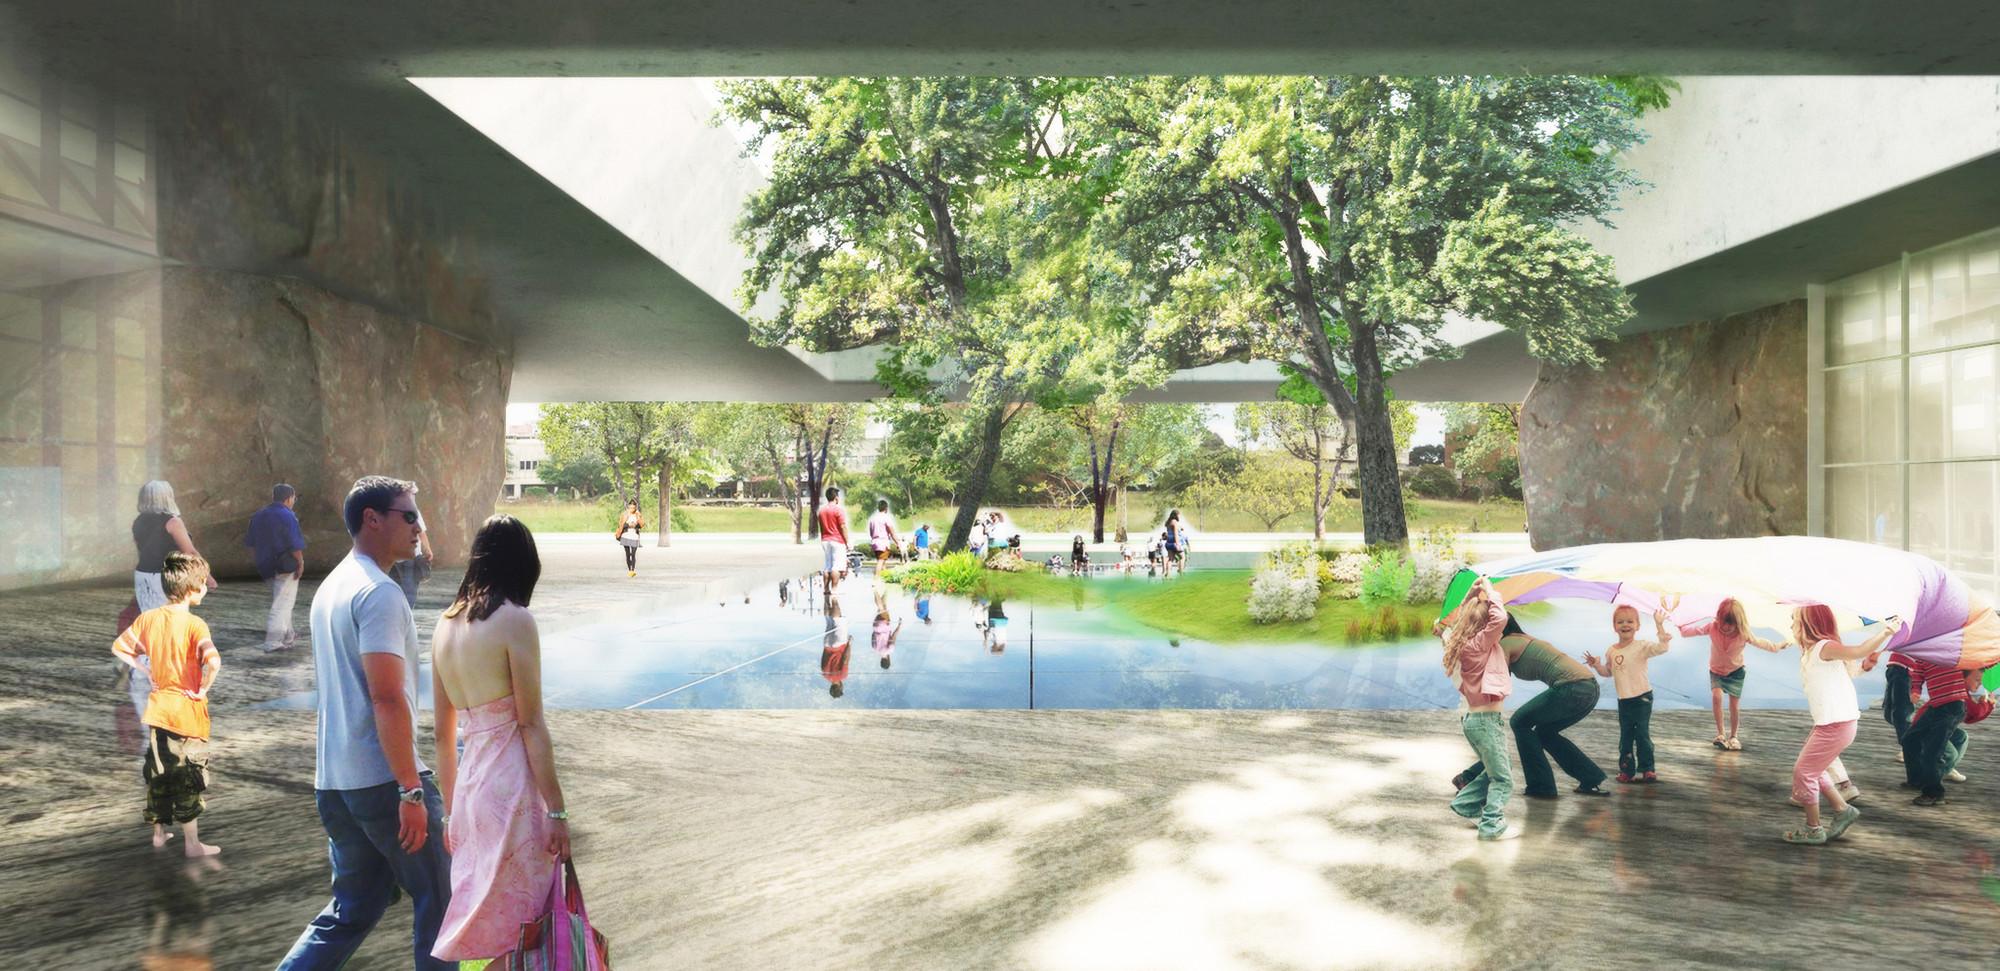 Plaza cubierta. Image Cortesia de adjkm + Montemayor Arquitectos + VEPICA